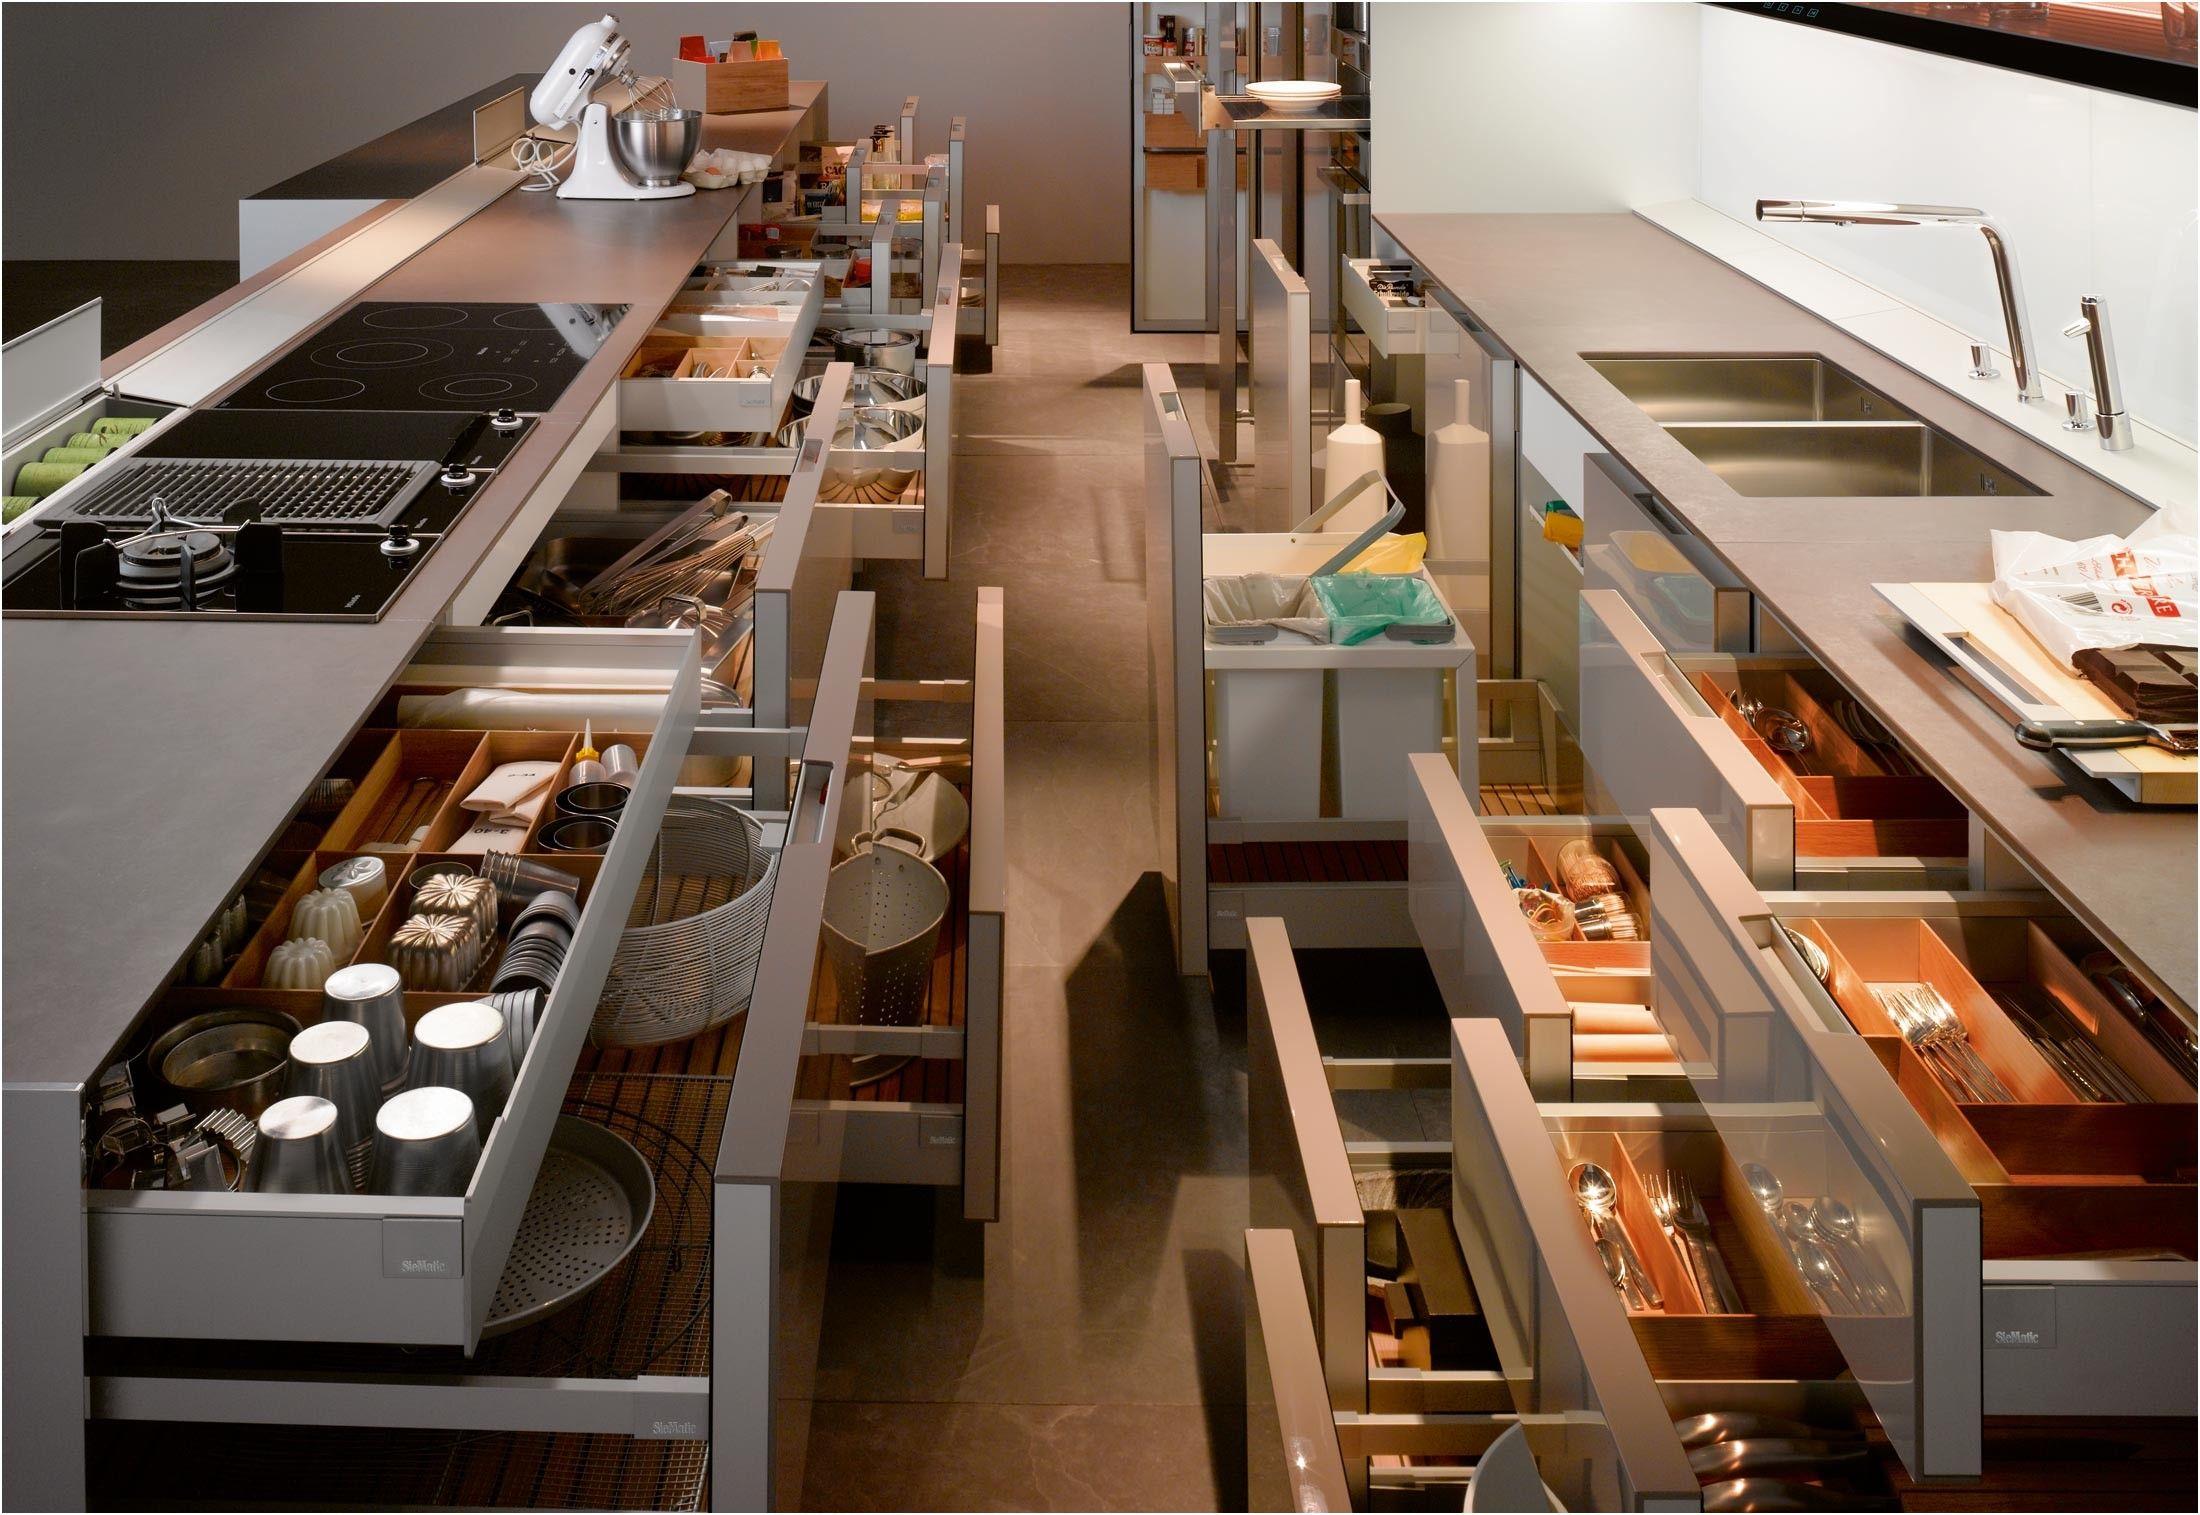 Kitchen Storage Cabinets India Design Inspiration Furniture Design